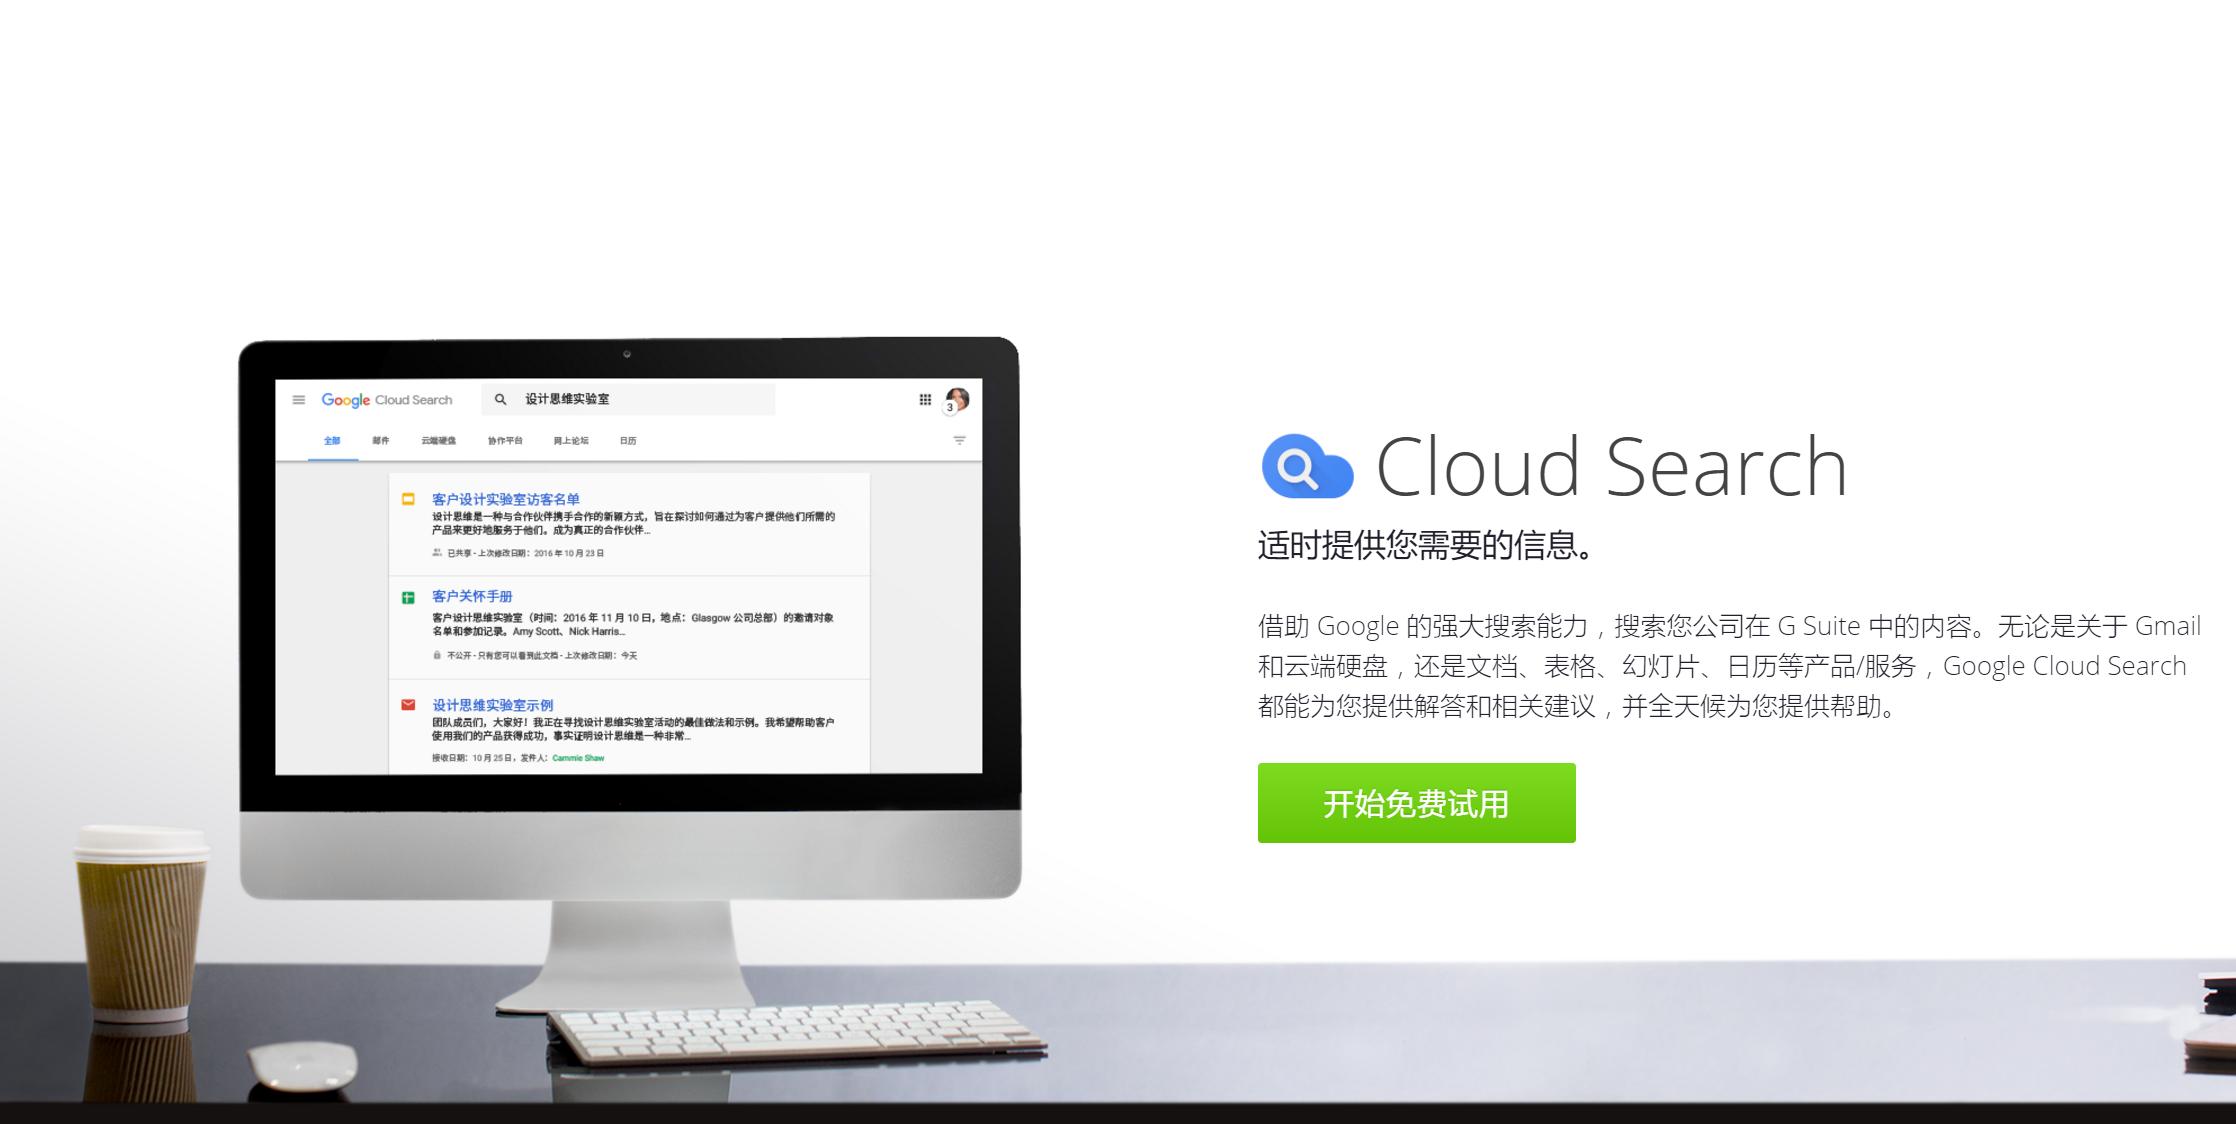 FireShot Capture 2 - Google Cloud Search – 搜索 Gm_ - https___gsuite.google.com_products_cloud-search_.png